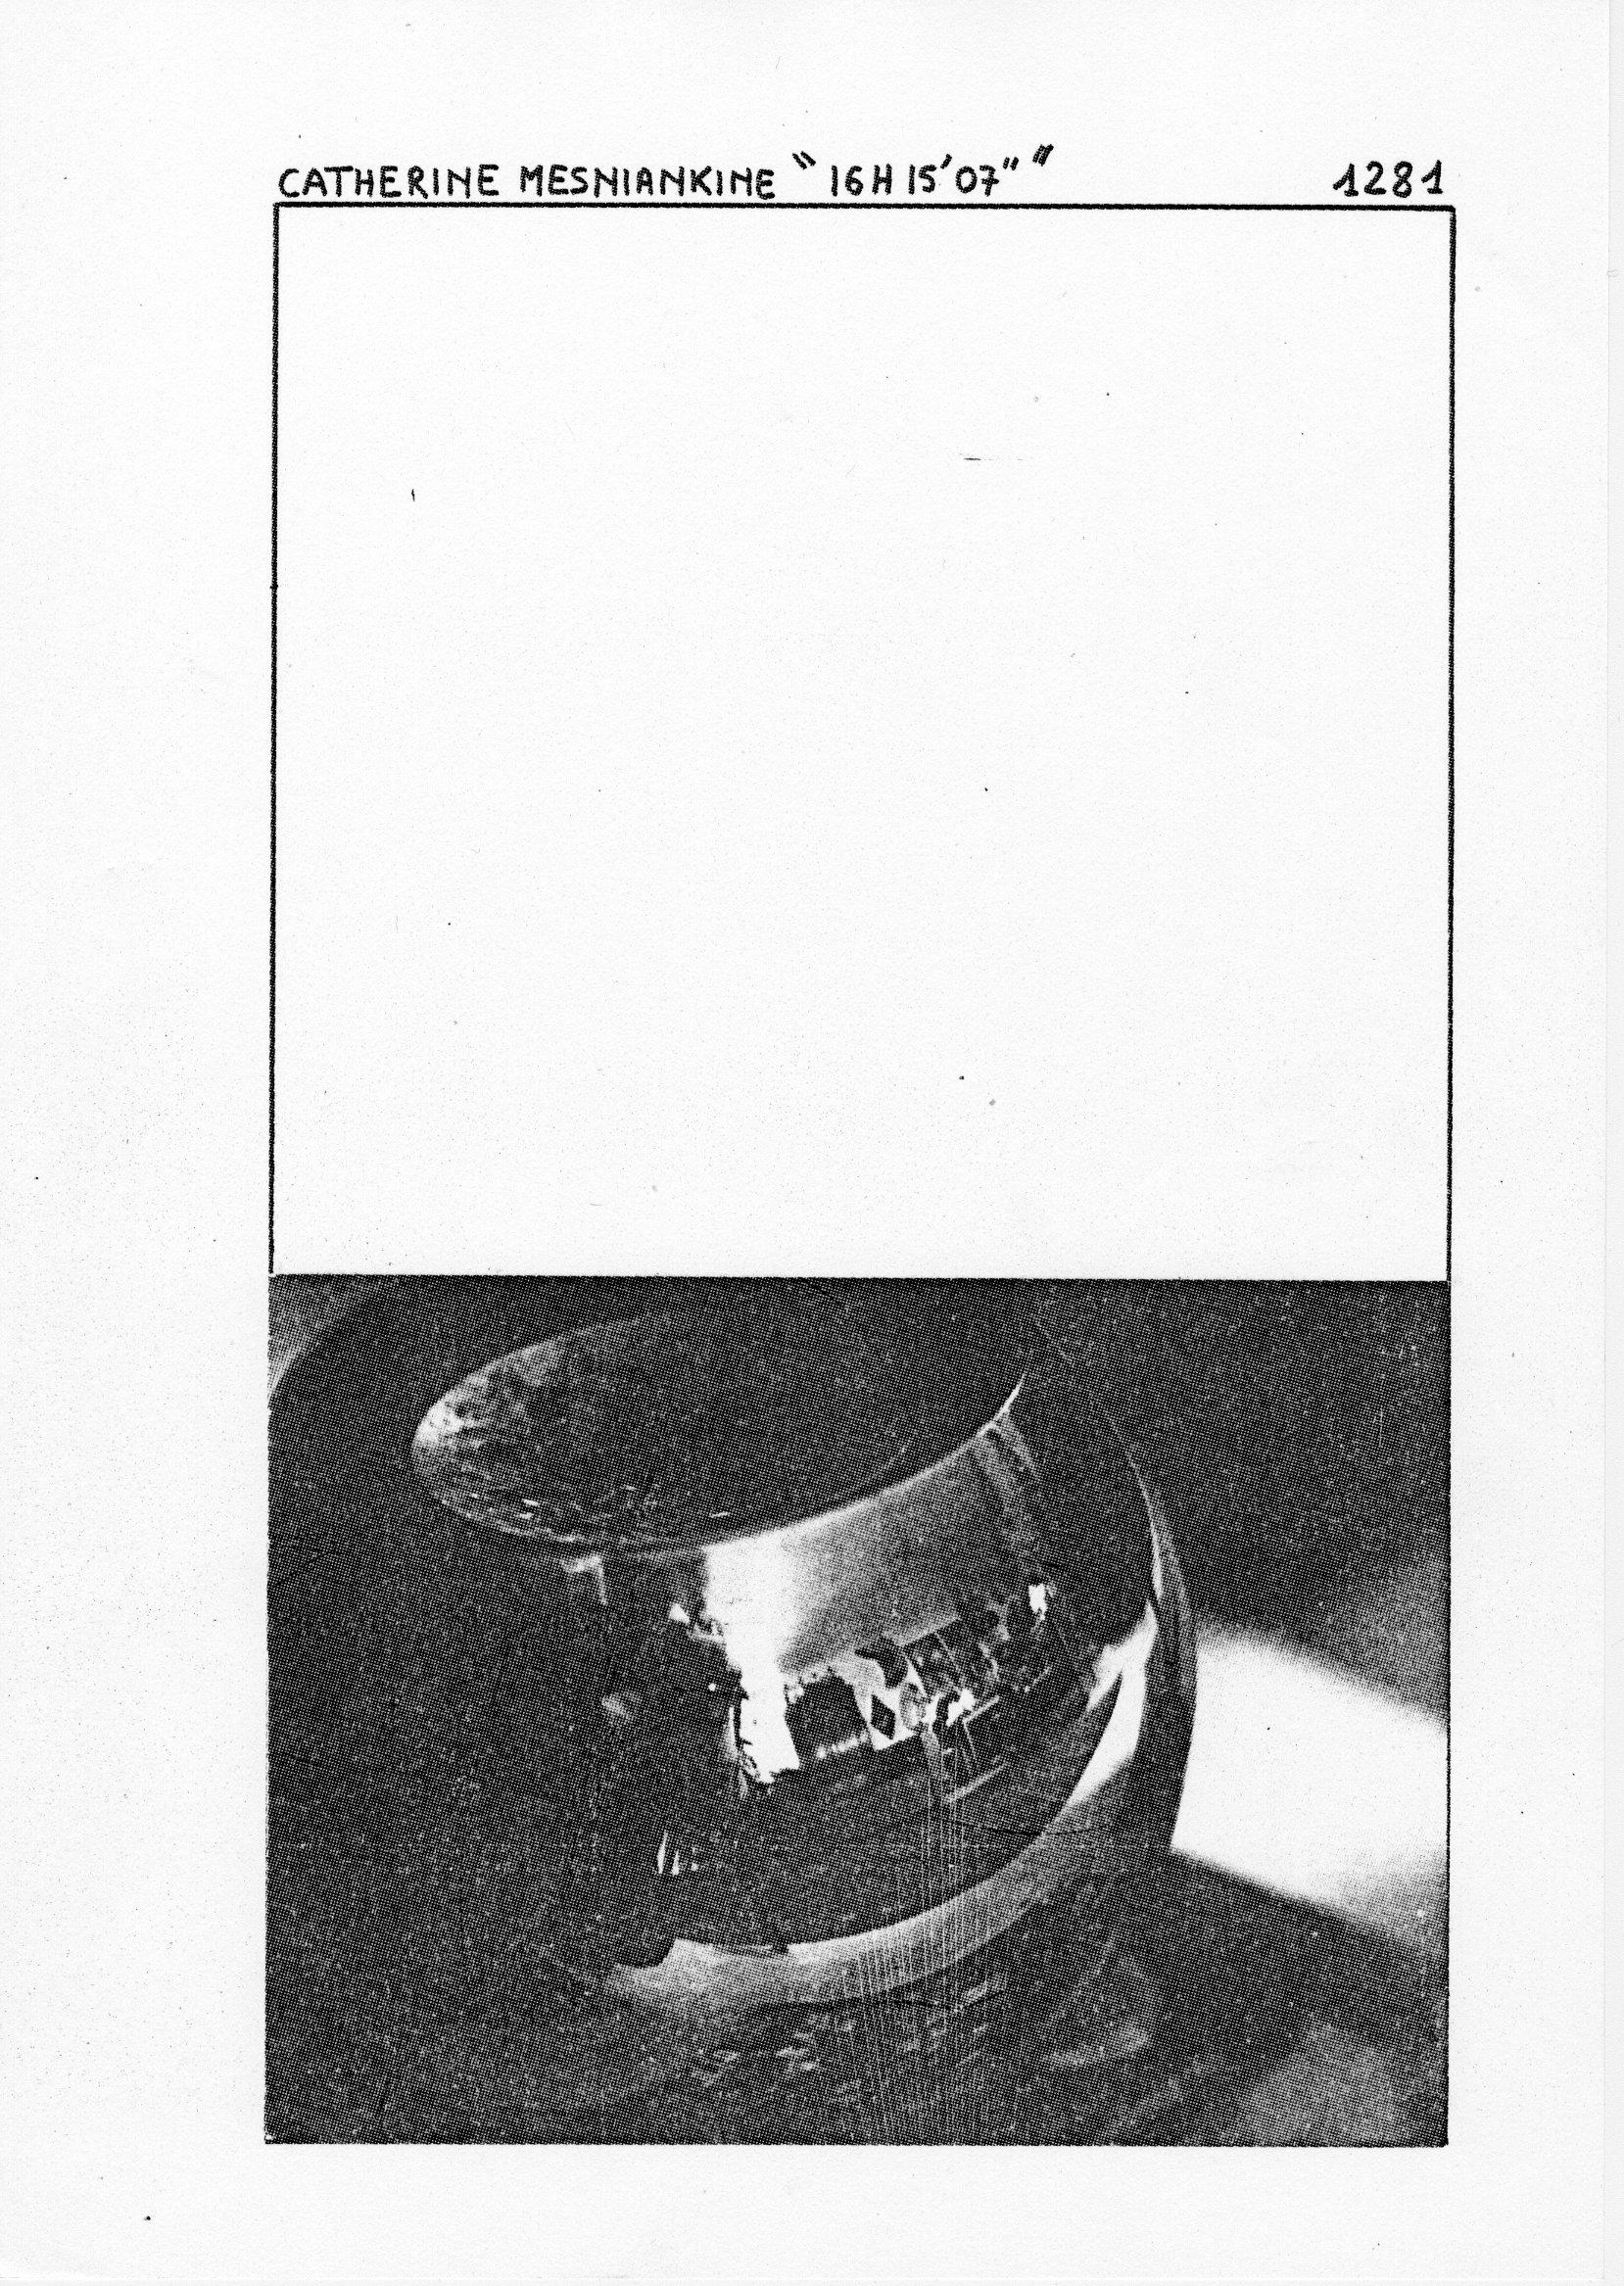 page 1281 C. MESNIANKINE 16 H 15' 07''